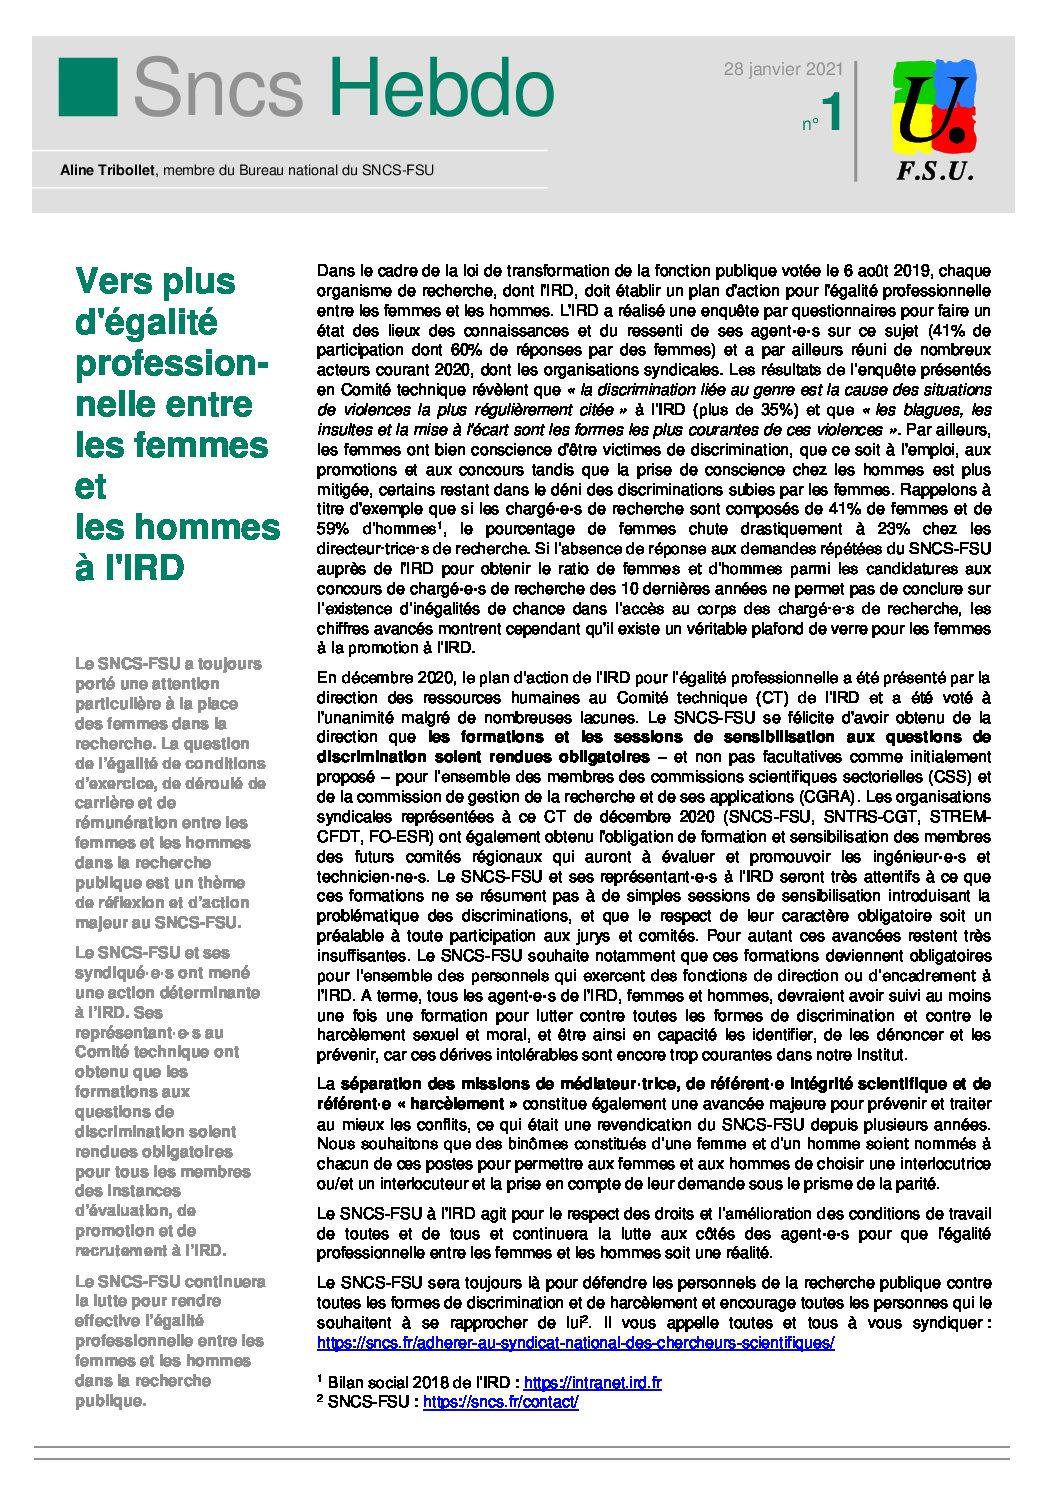 SNCSHebdo21N°1-5-pdf.jpg